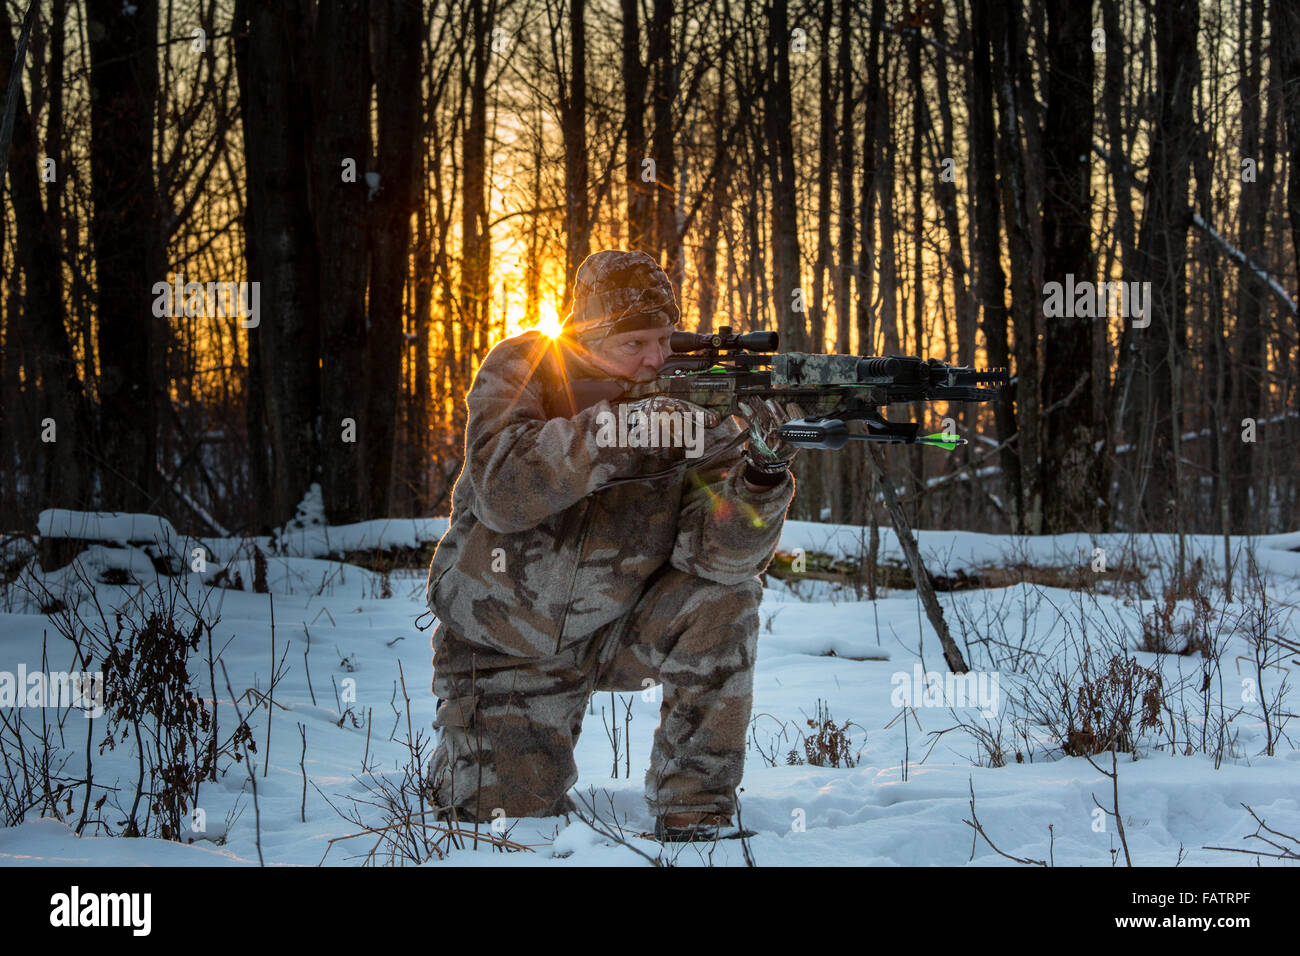 Crossbow hunter taking aim - Stock Image